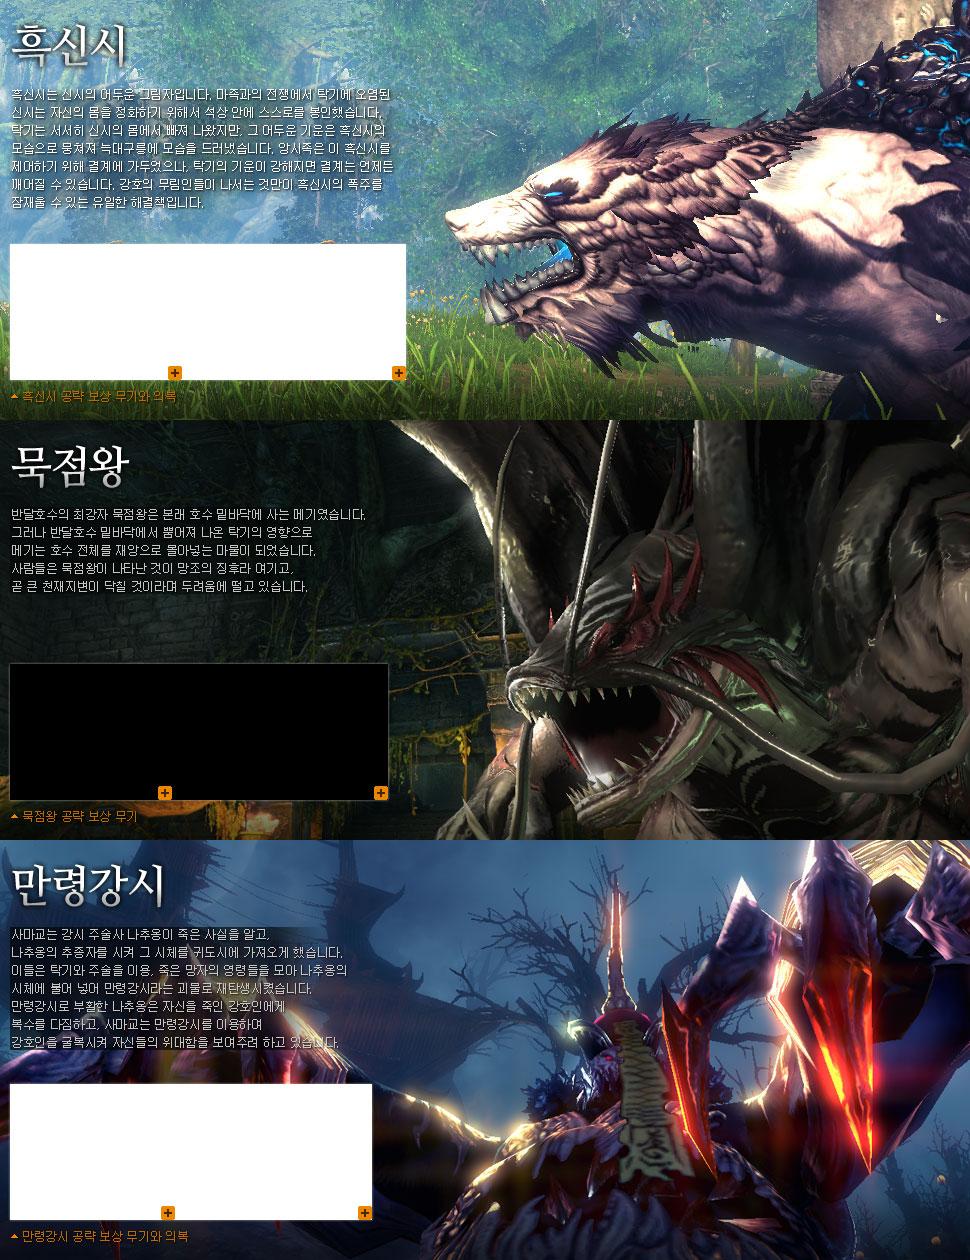 bg_contents2.jpg